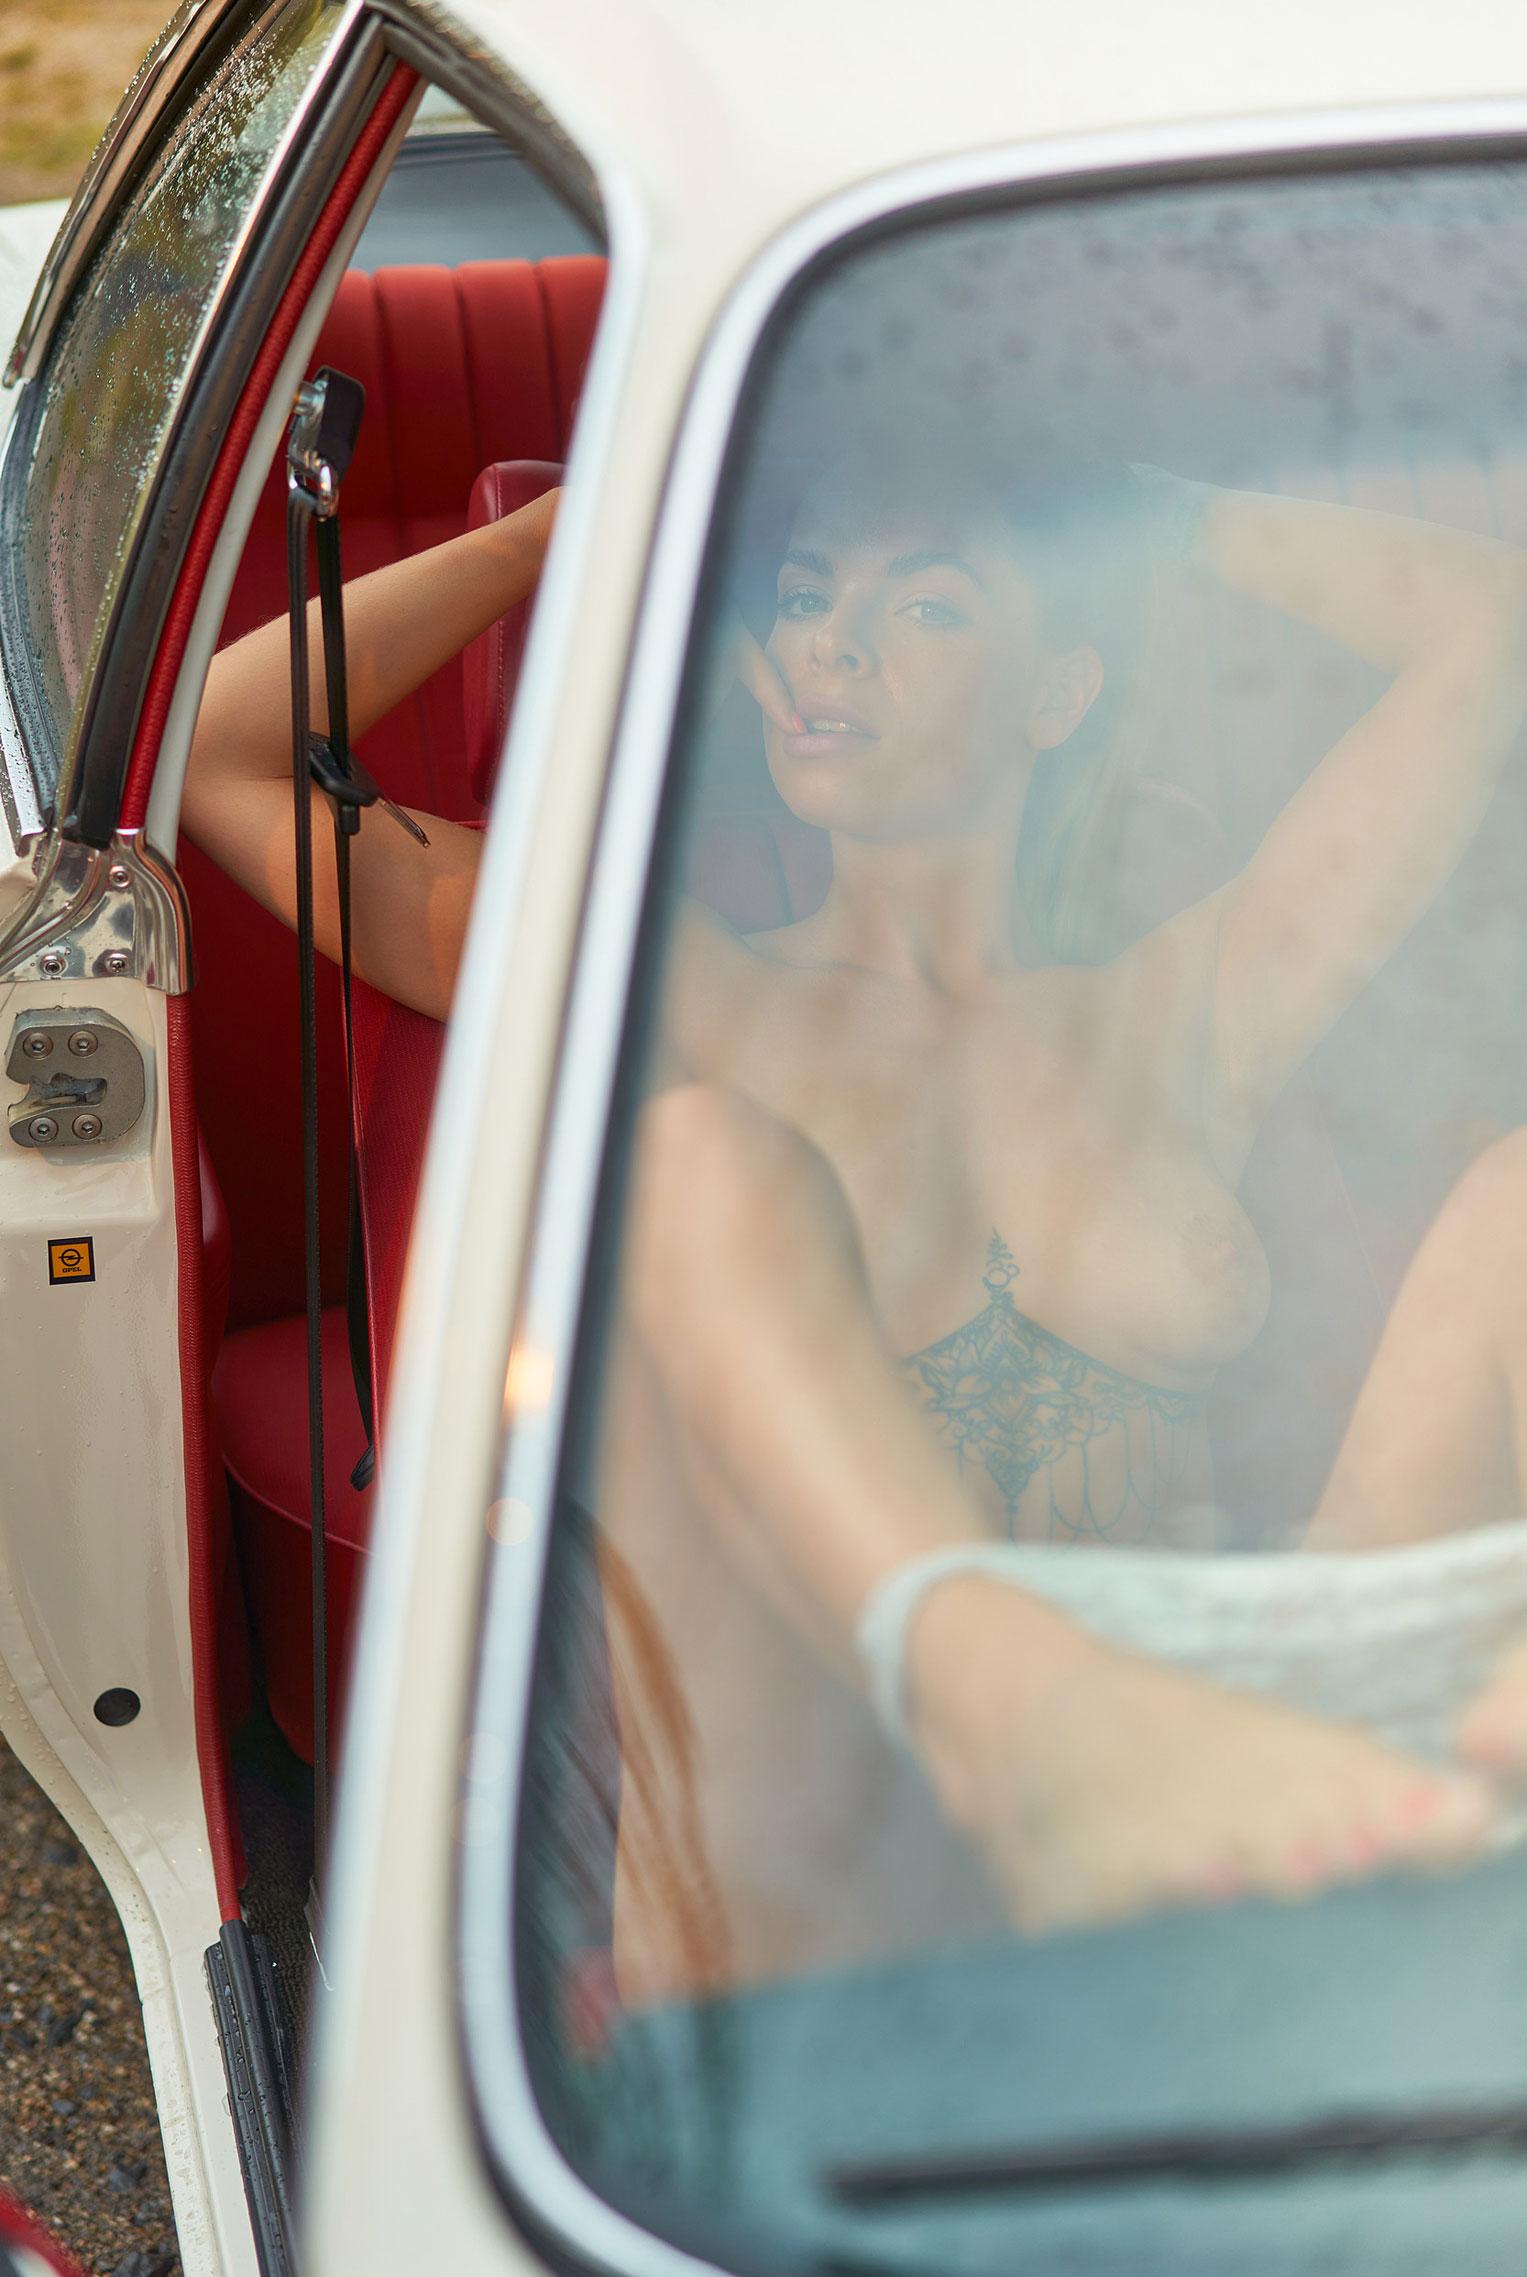 Anna-Lena - Simon Bolz (Playboy) photoshoot